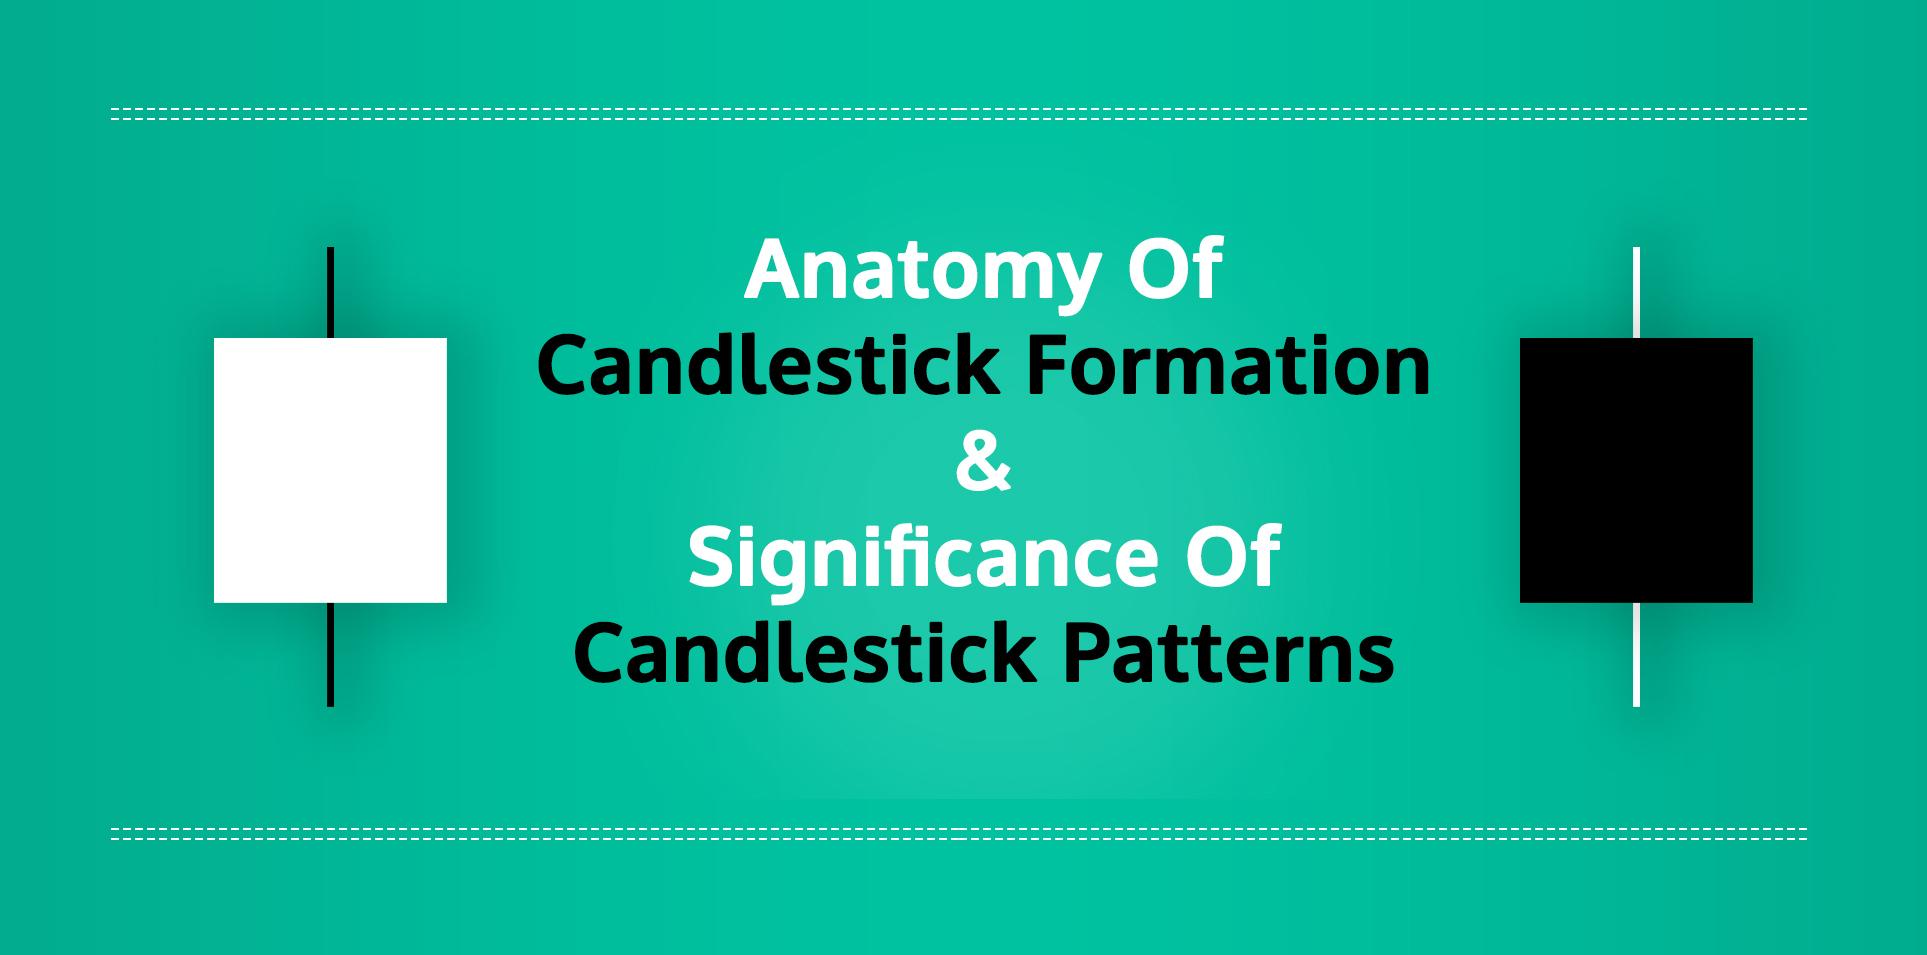 Candlestick Patterns And Anatomy